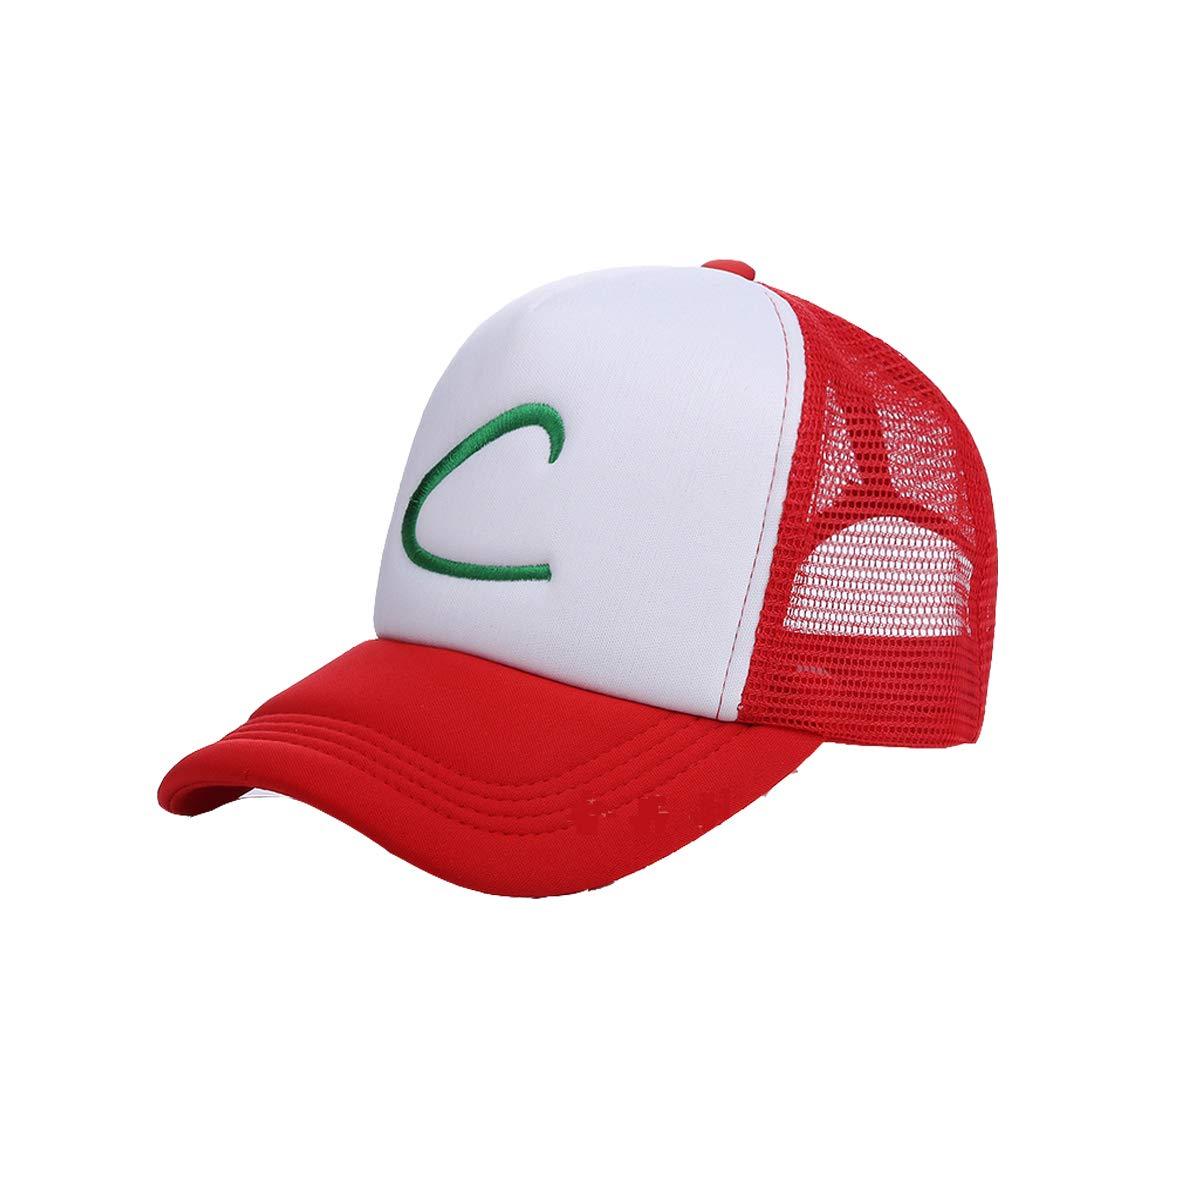 the latest 943ad 91f70 Amazon.com  Pokemon Ash Ketchum Unisex-Adult Trucker Hat -One-Size  Redl White  Clothing